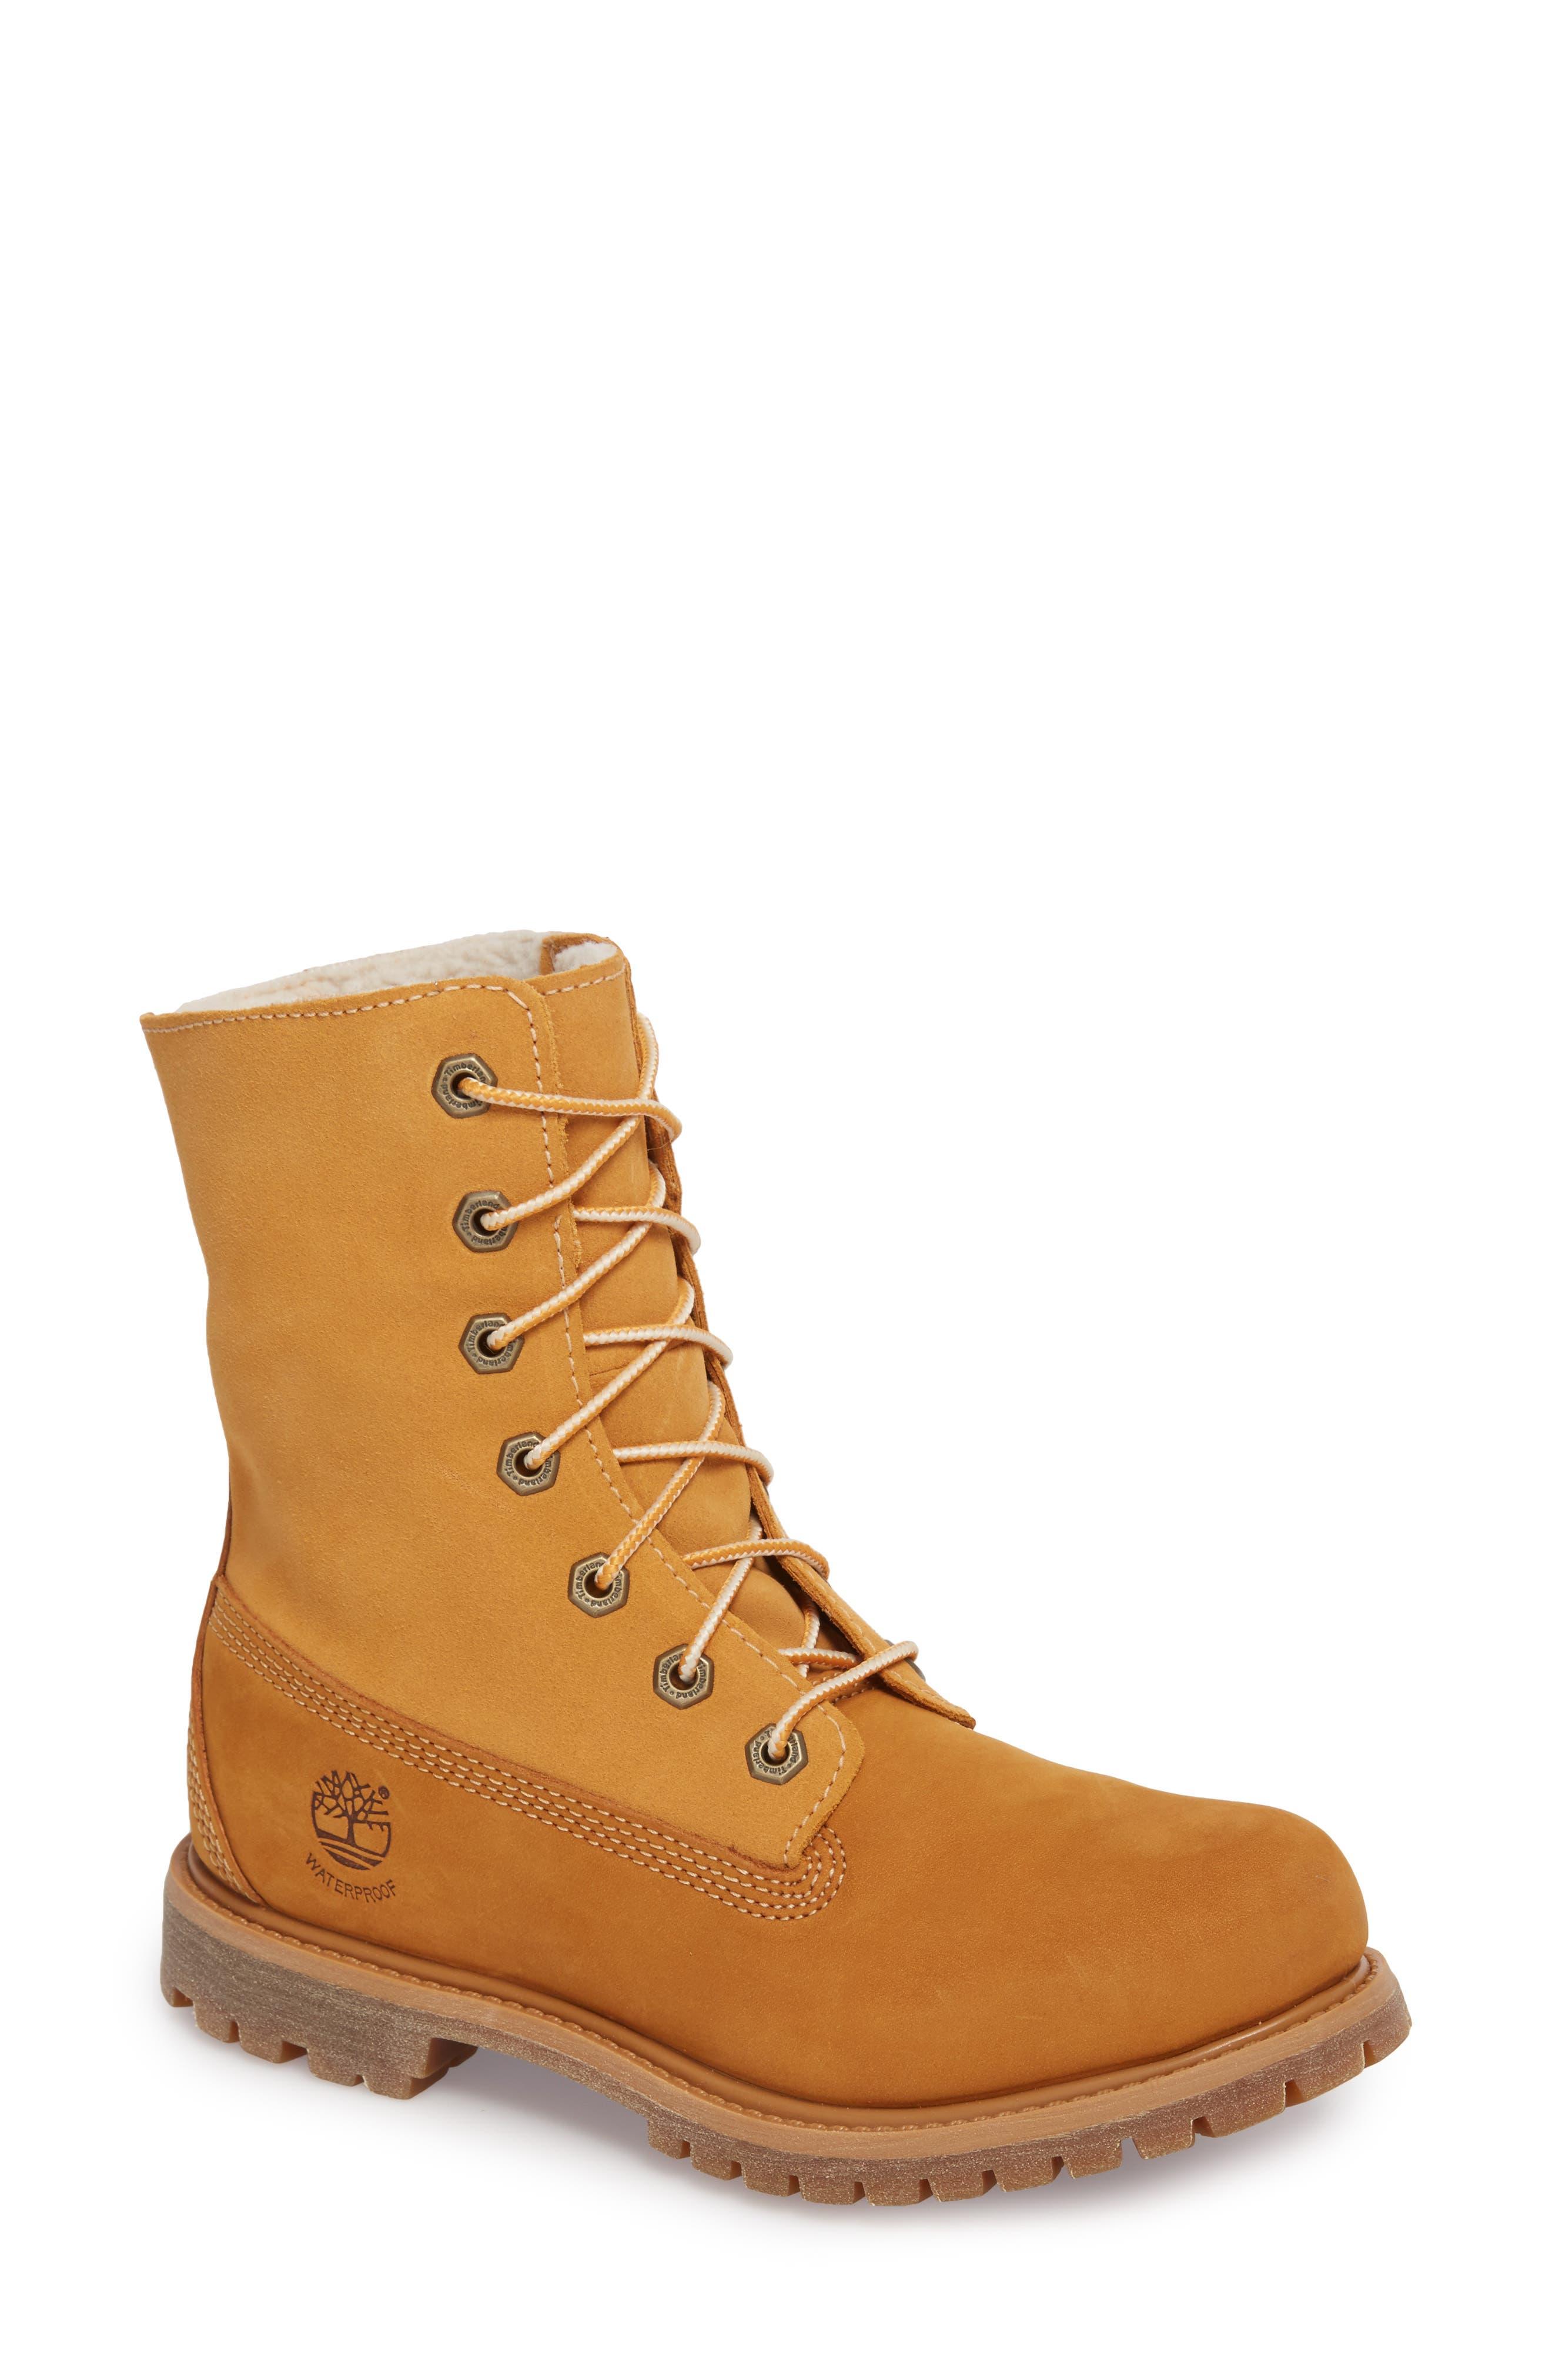 Authentic Waterproof Teddy Fleece Lined Winter Boot,                         Main,                         color, 210